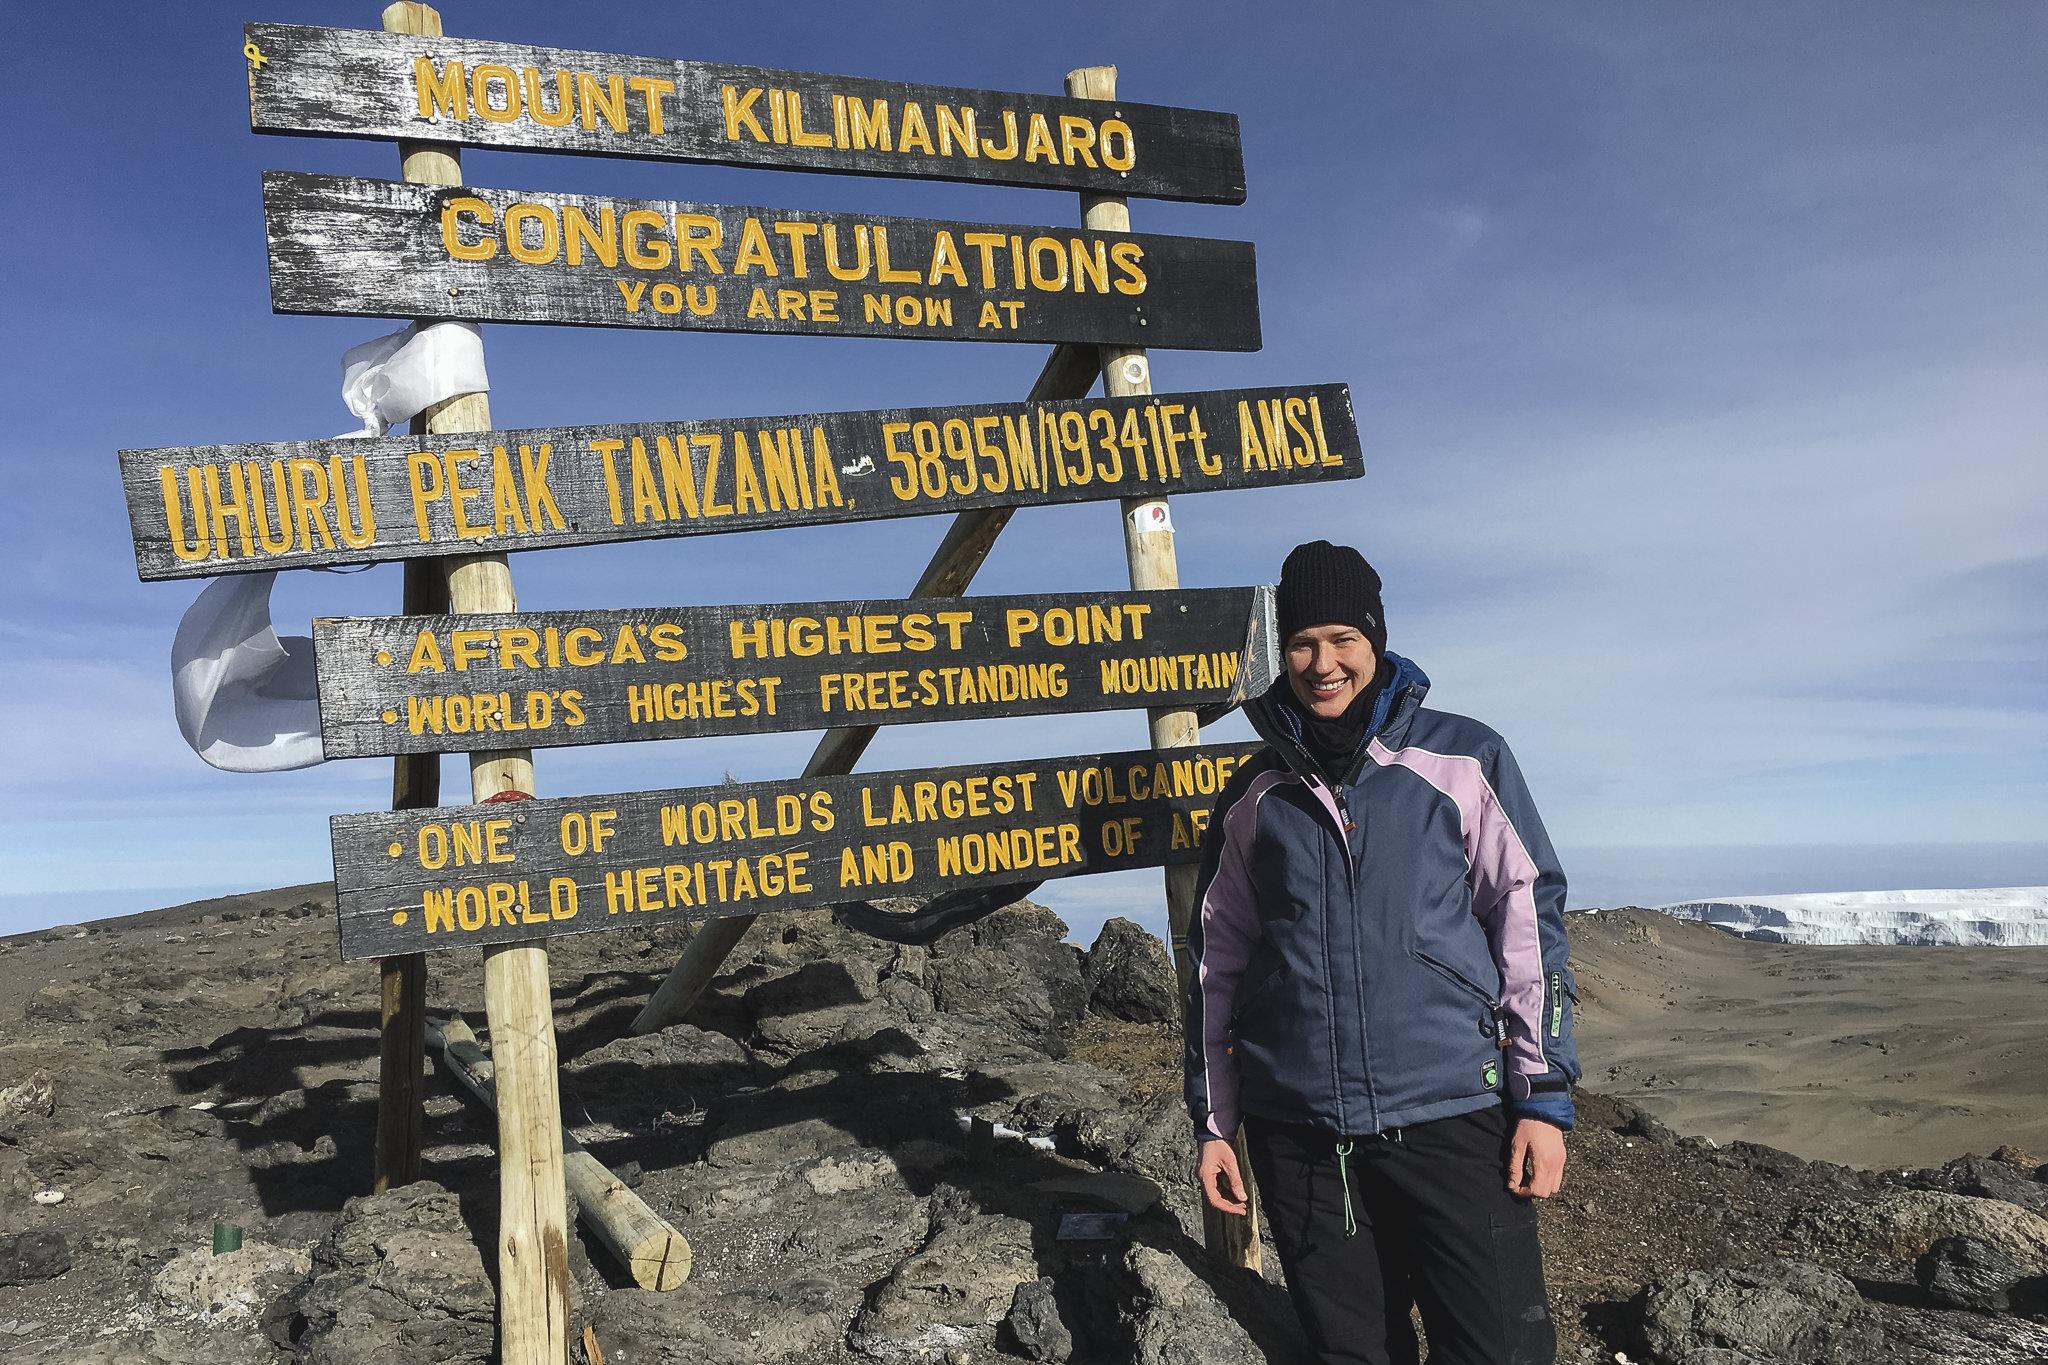 Kilimanjaro - 225